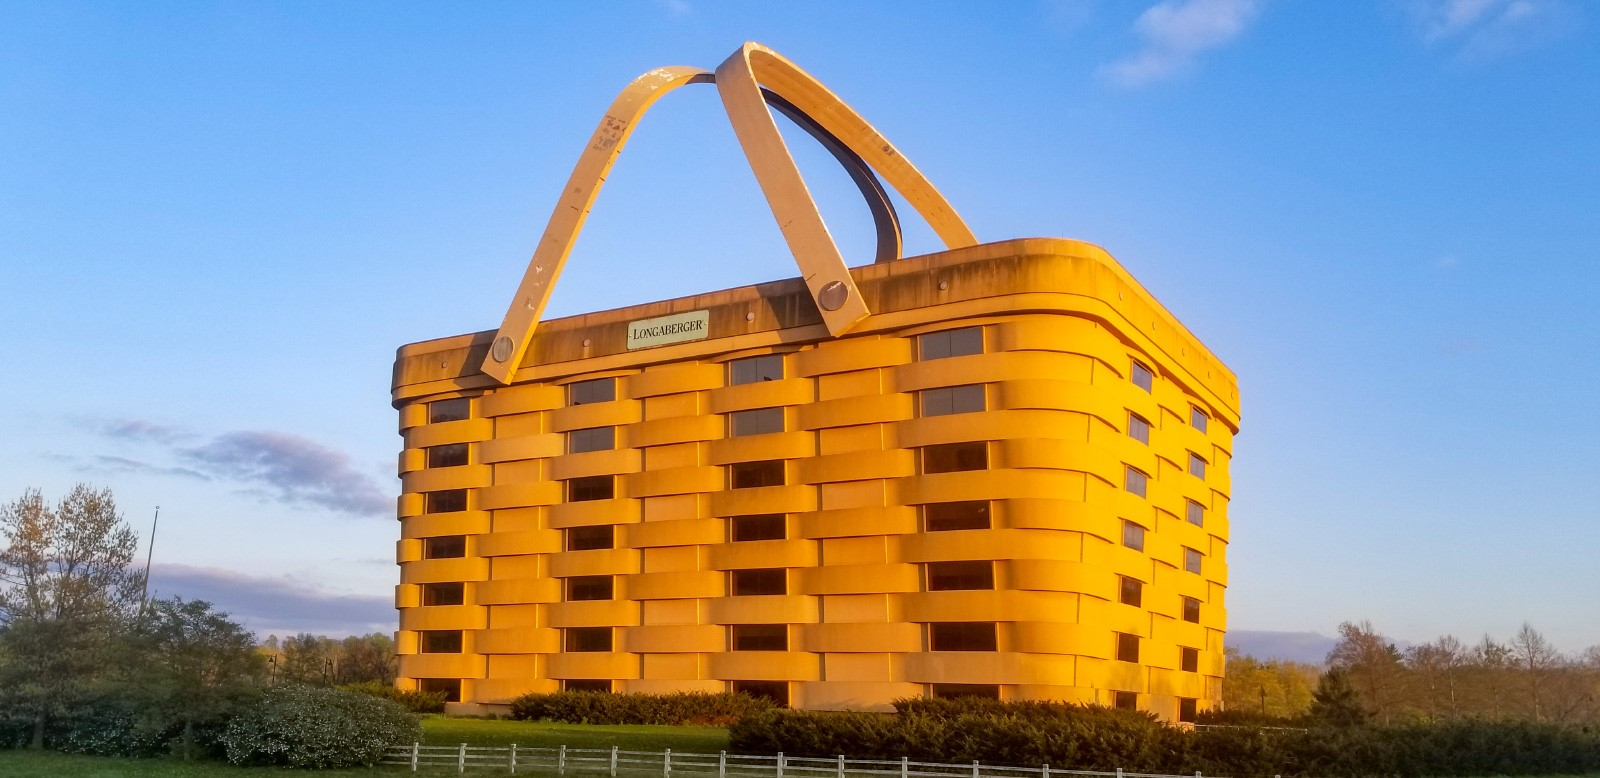 Longaberger Basket Building by NBBJ and Korda Nemeth Engineering: Ohio town's civic pride - Sheet2